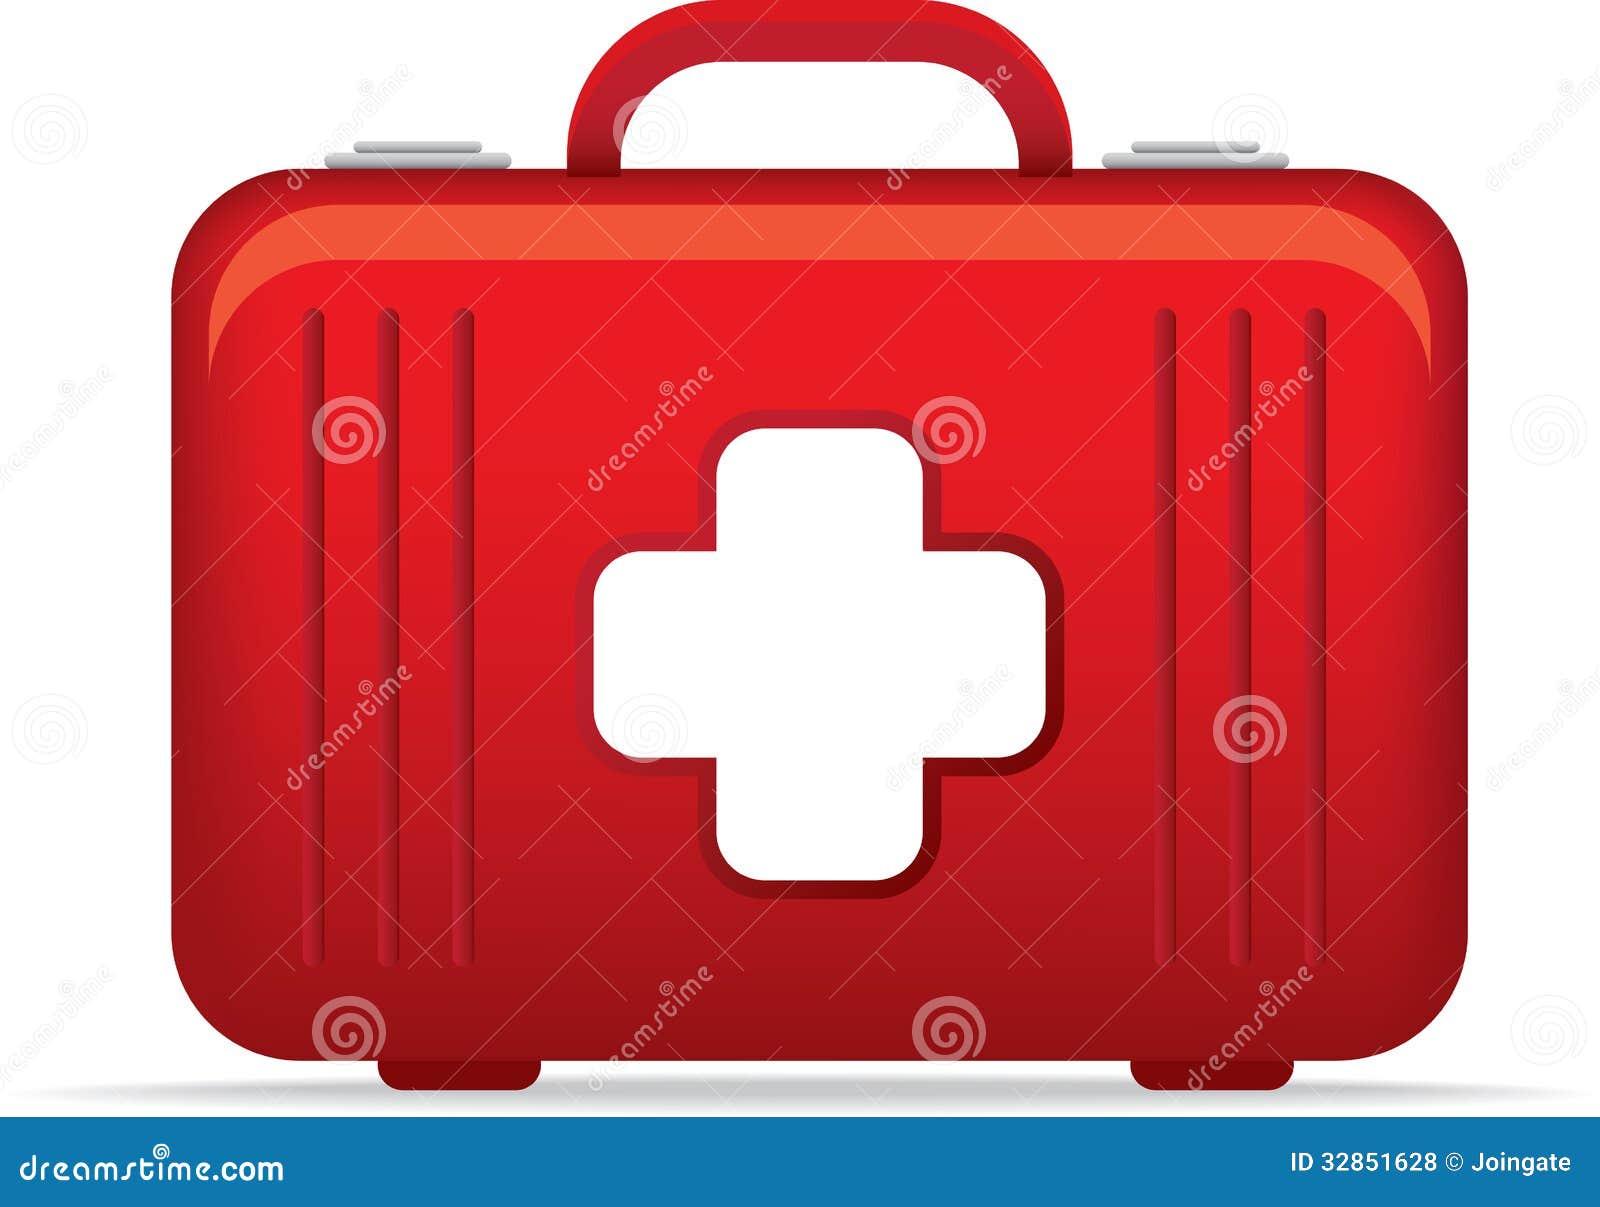 emergency medical kit bag icon or symbol illustrat royalty